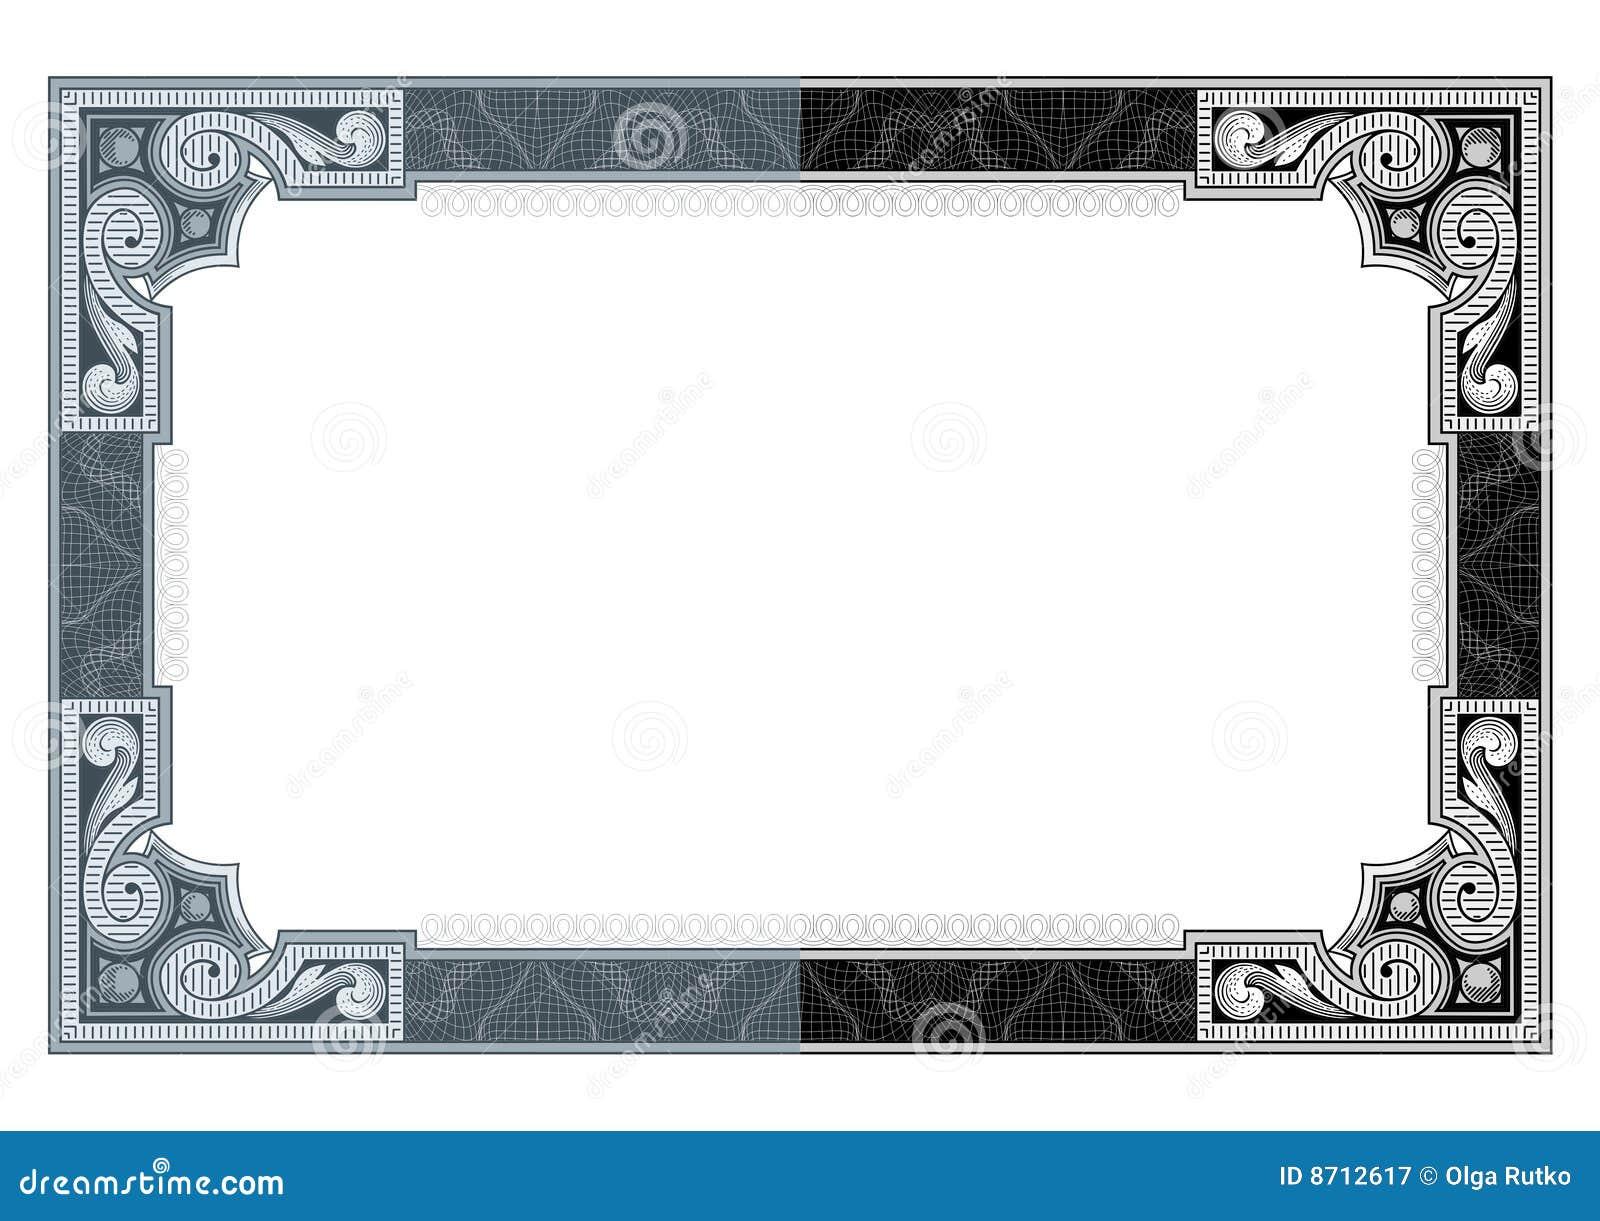 Secure design frame vector stock vector. Illustration of badge - 5895621